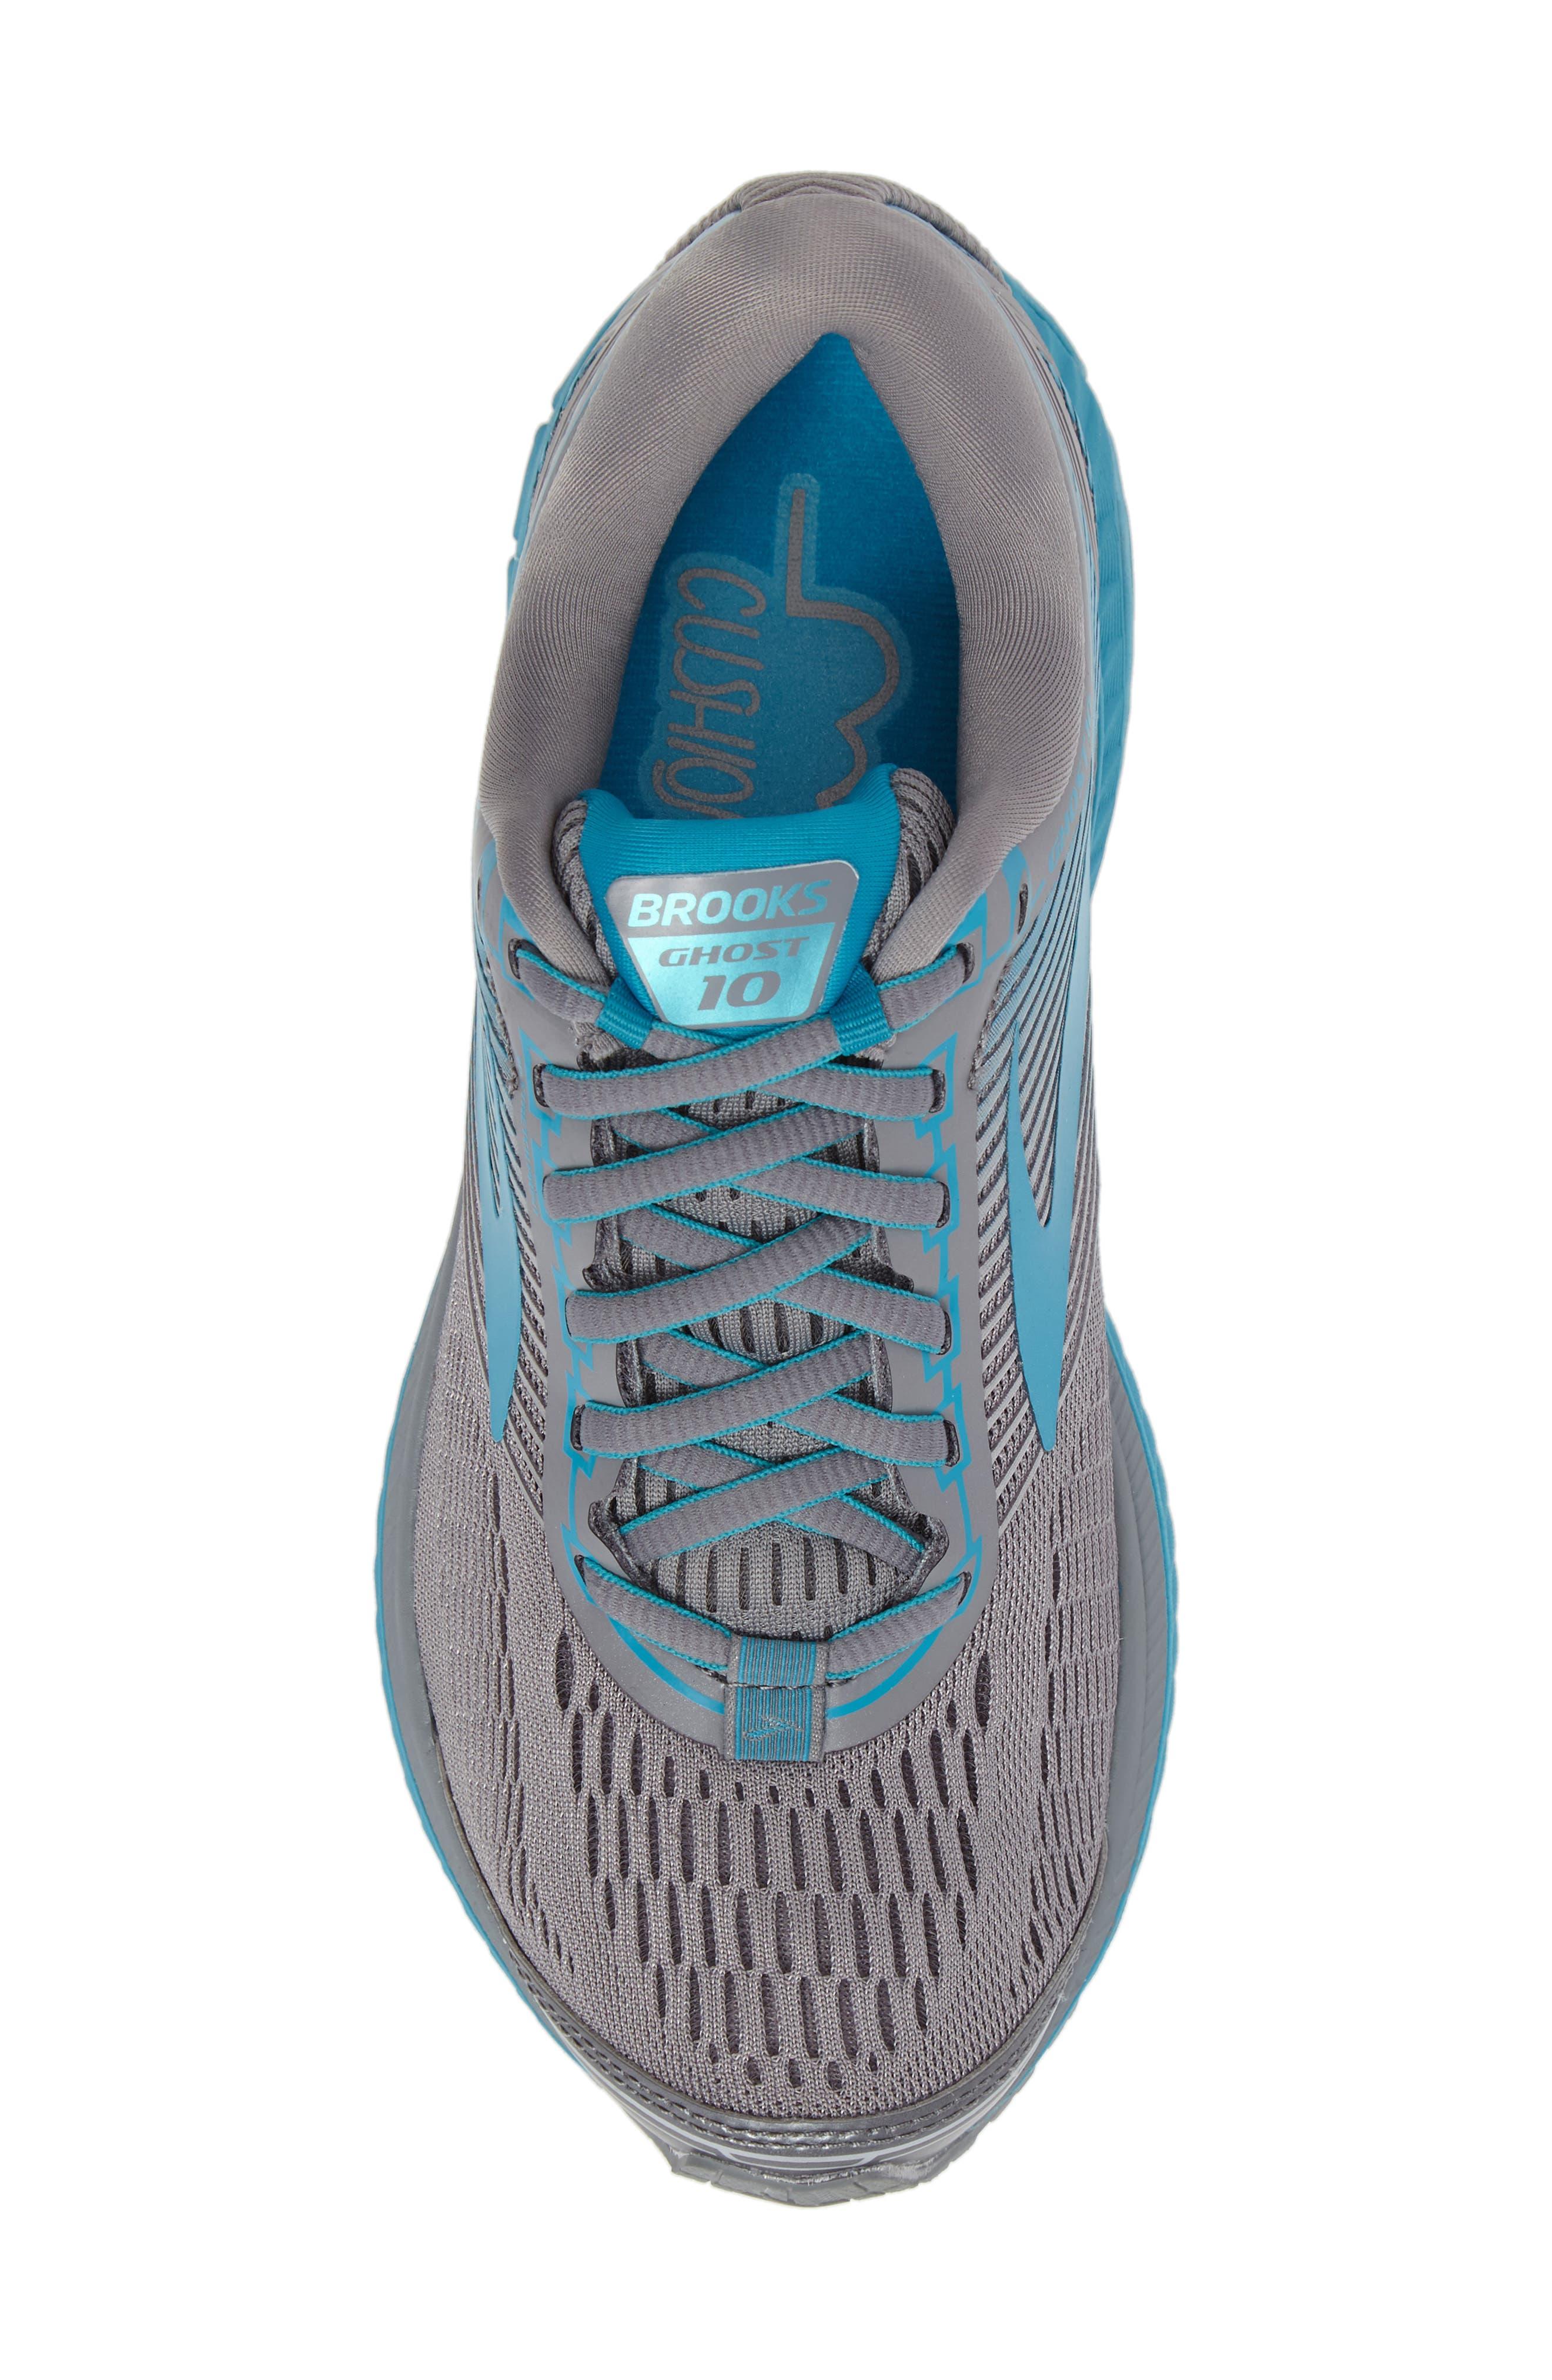 Ghost 10 Running Shoe,                             Alternate thumbnail 5, color,                             Primer Grey/ Teal/ Silver